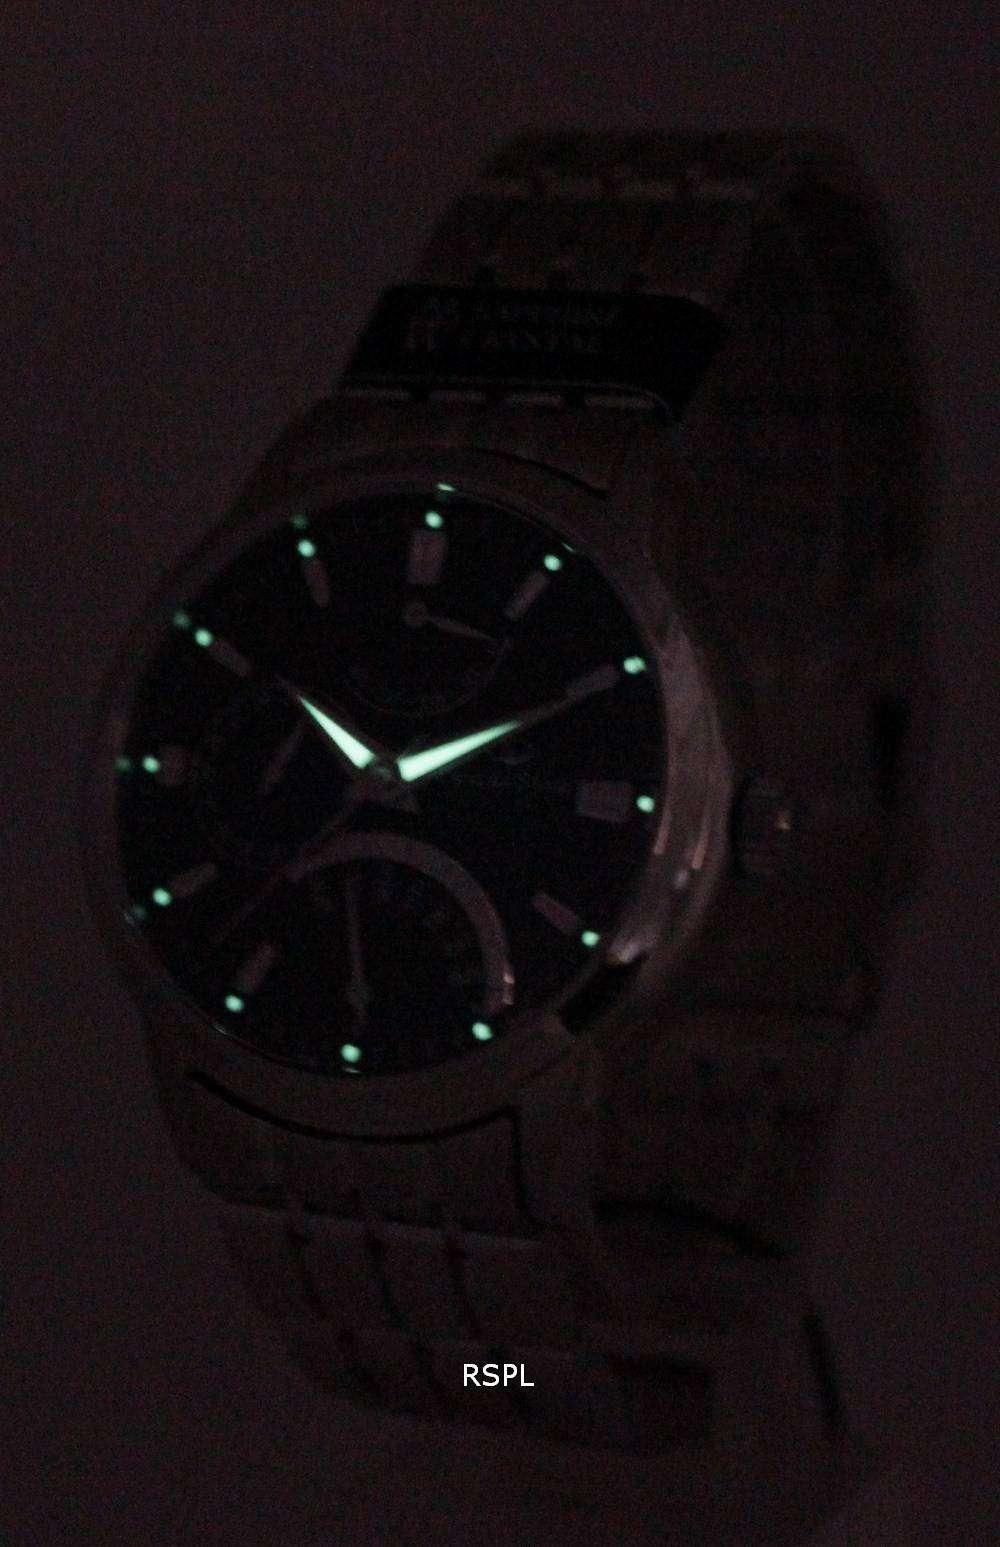 OrientStar Retrograde Power Reserve SDE00002B0 DE00002B0 Men's Watch